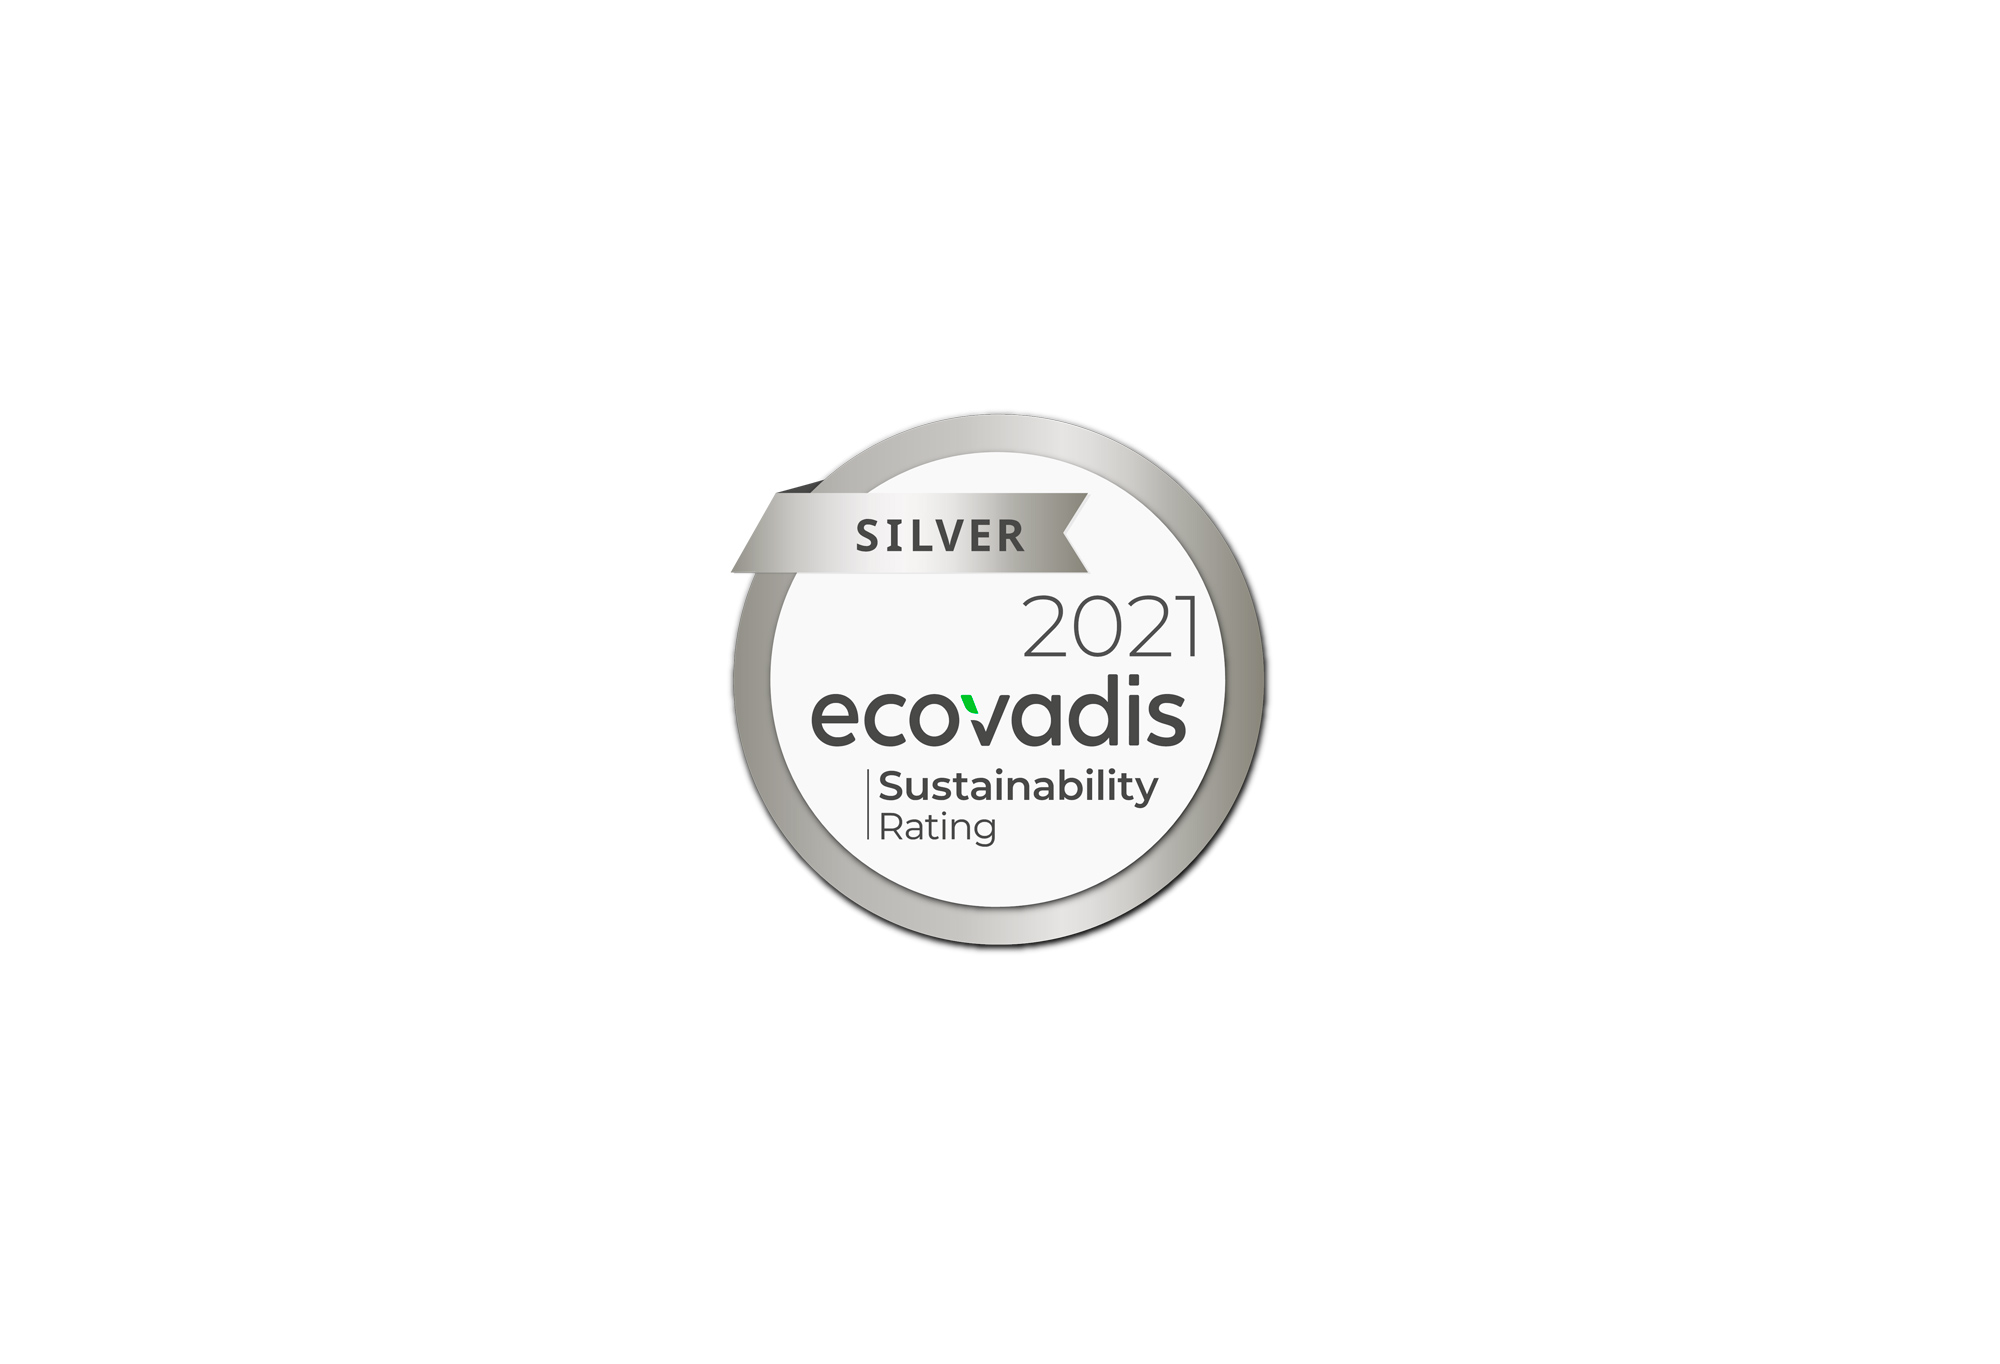 EcoVadis Silver Medal